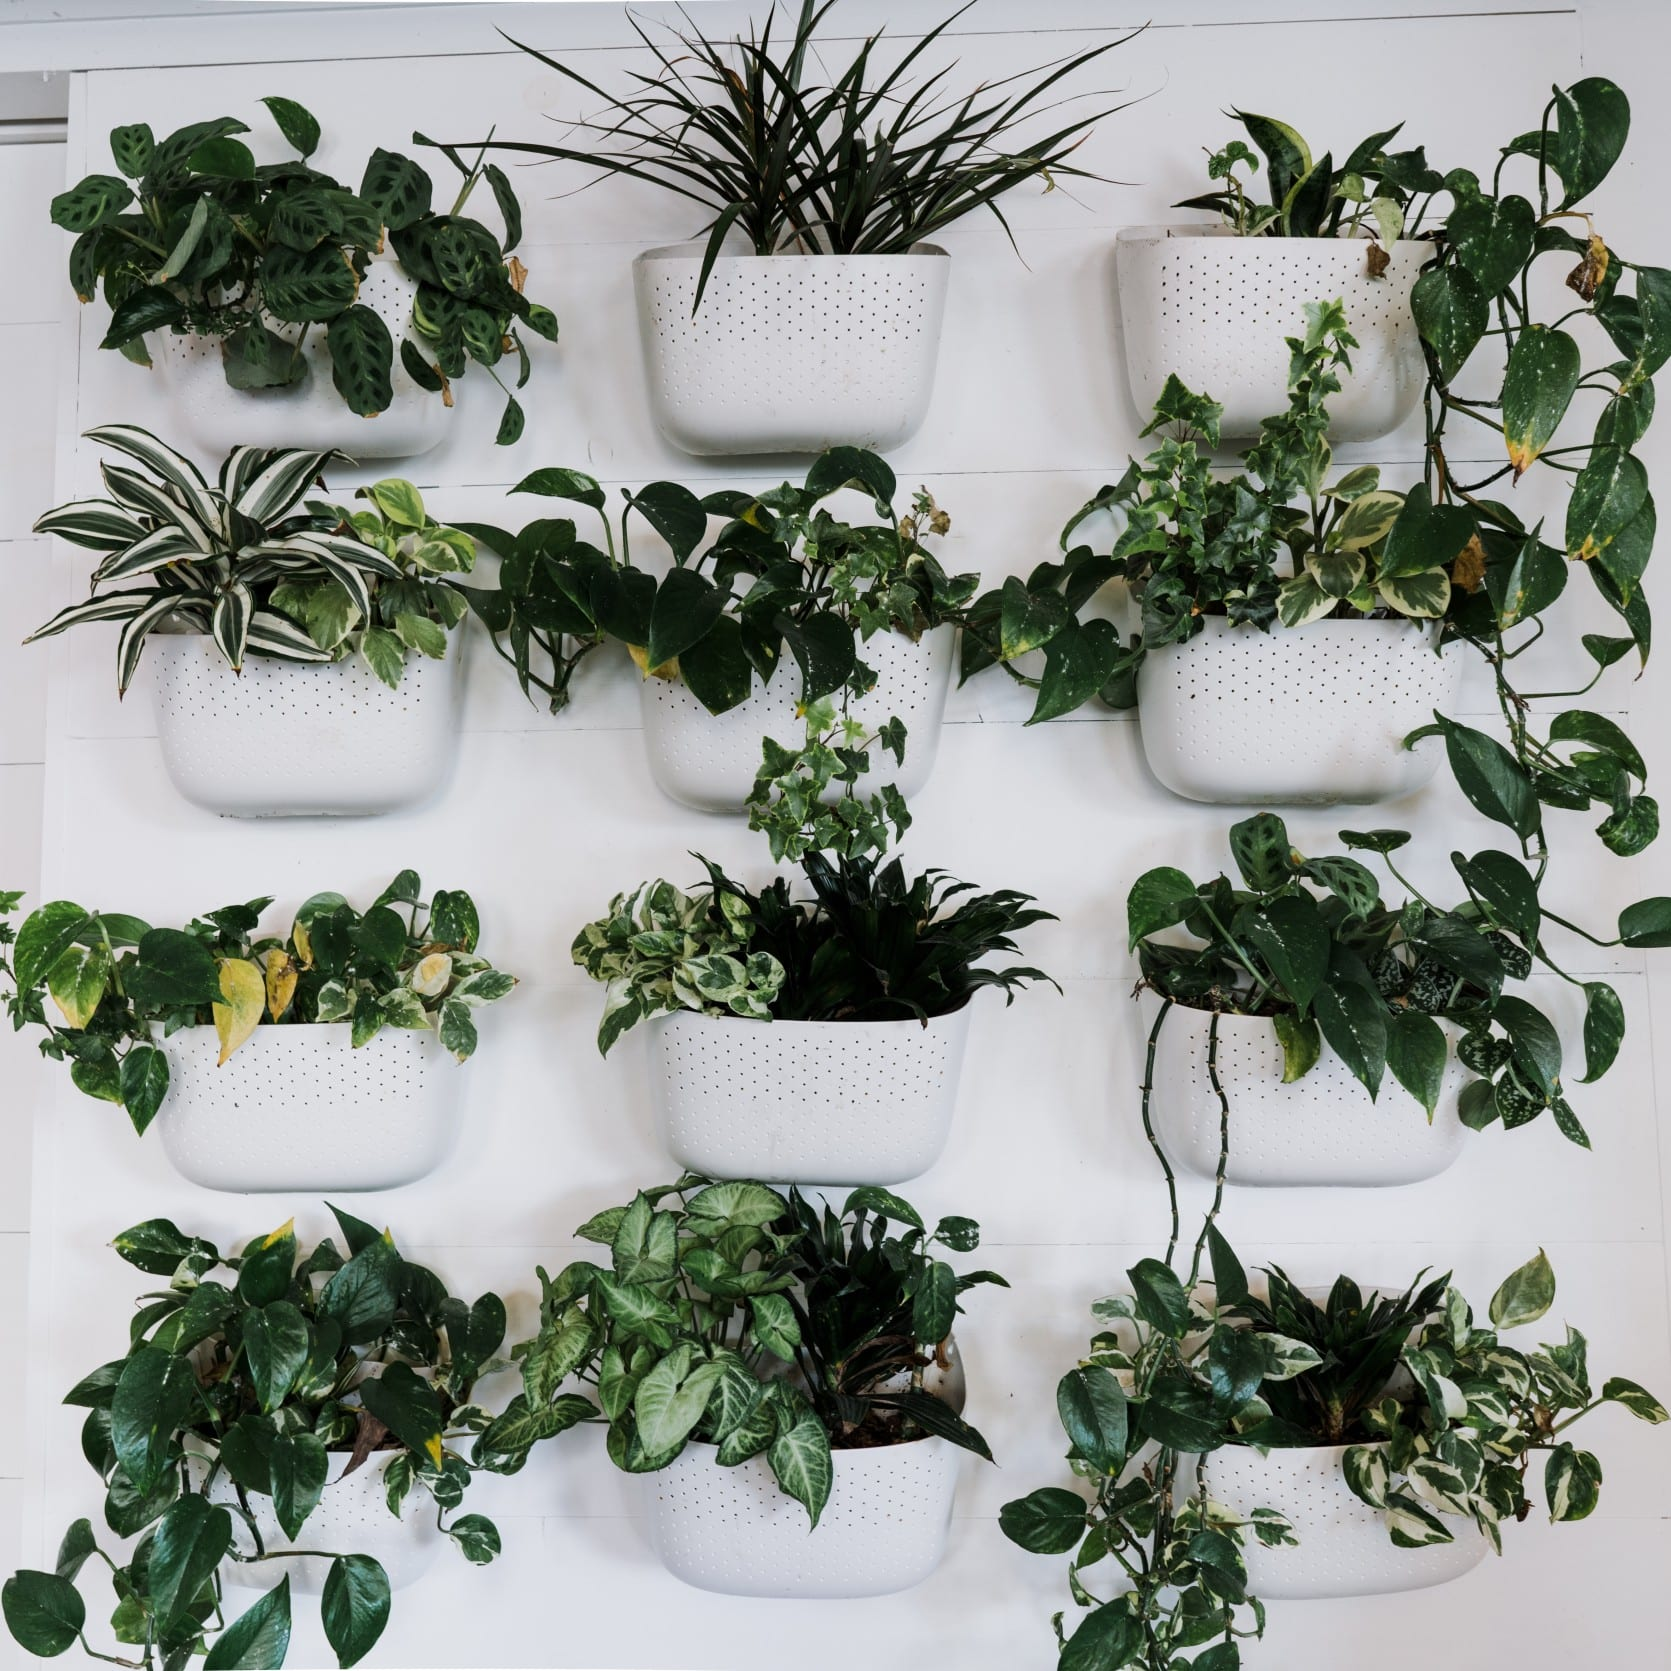 Lush Plants Hanging